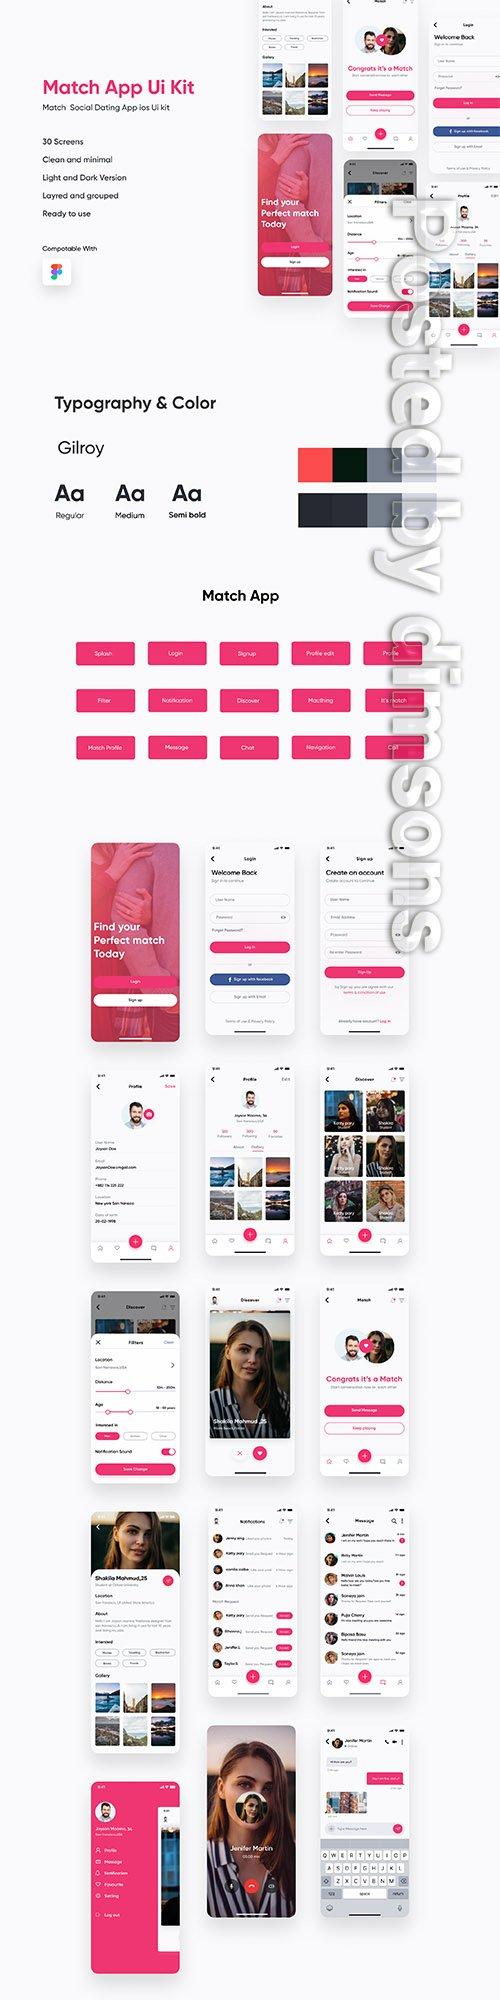 Match Dating App IOS UI Kit